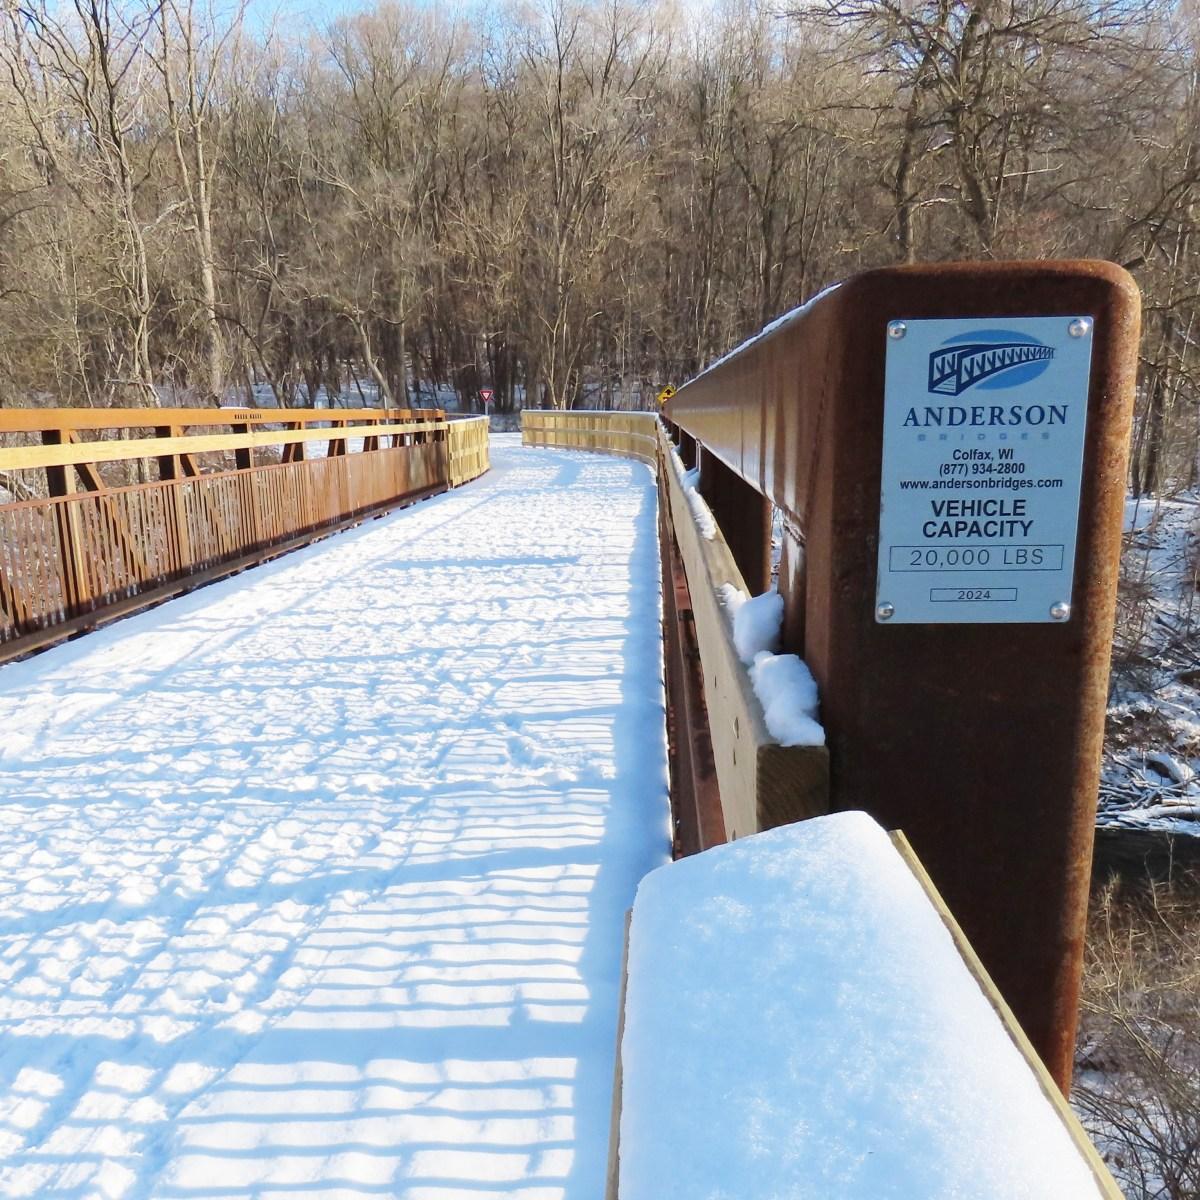 The Van Tassel Bridge covered in snow. The builder's sign (Anderson Bridges) is posted on the bridge's steel post.